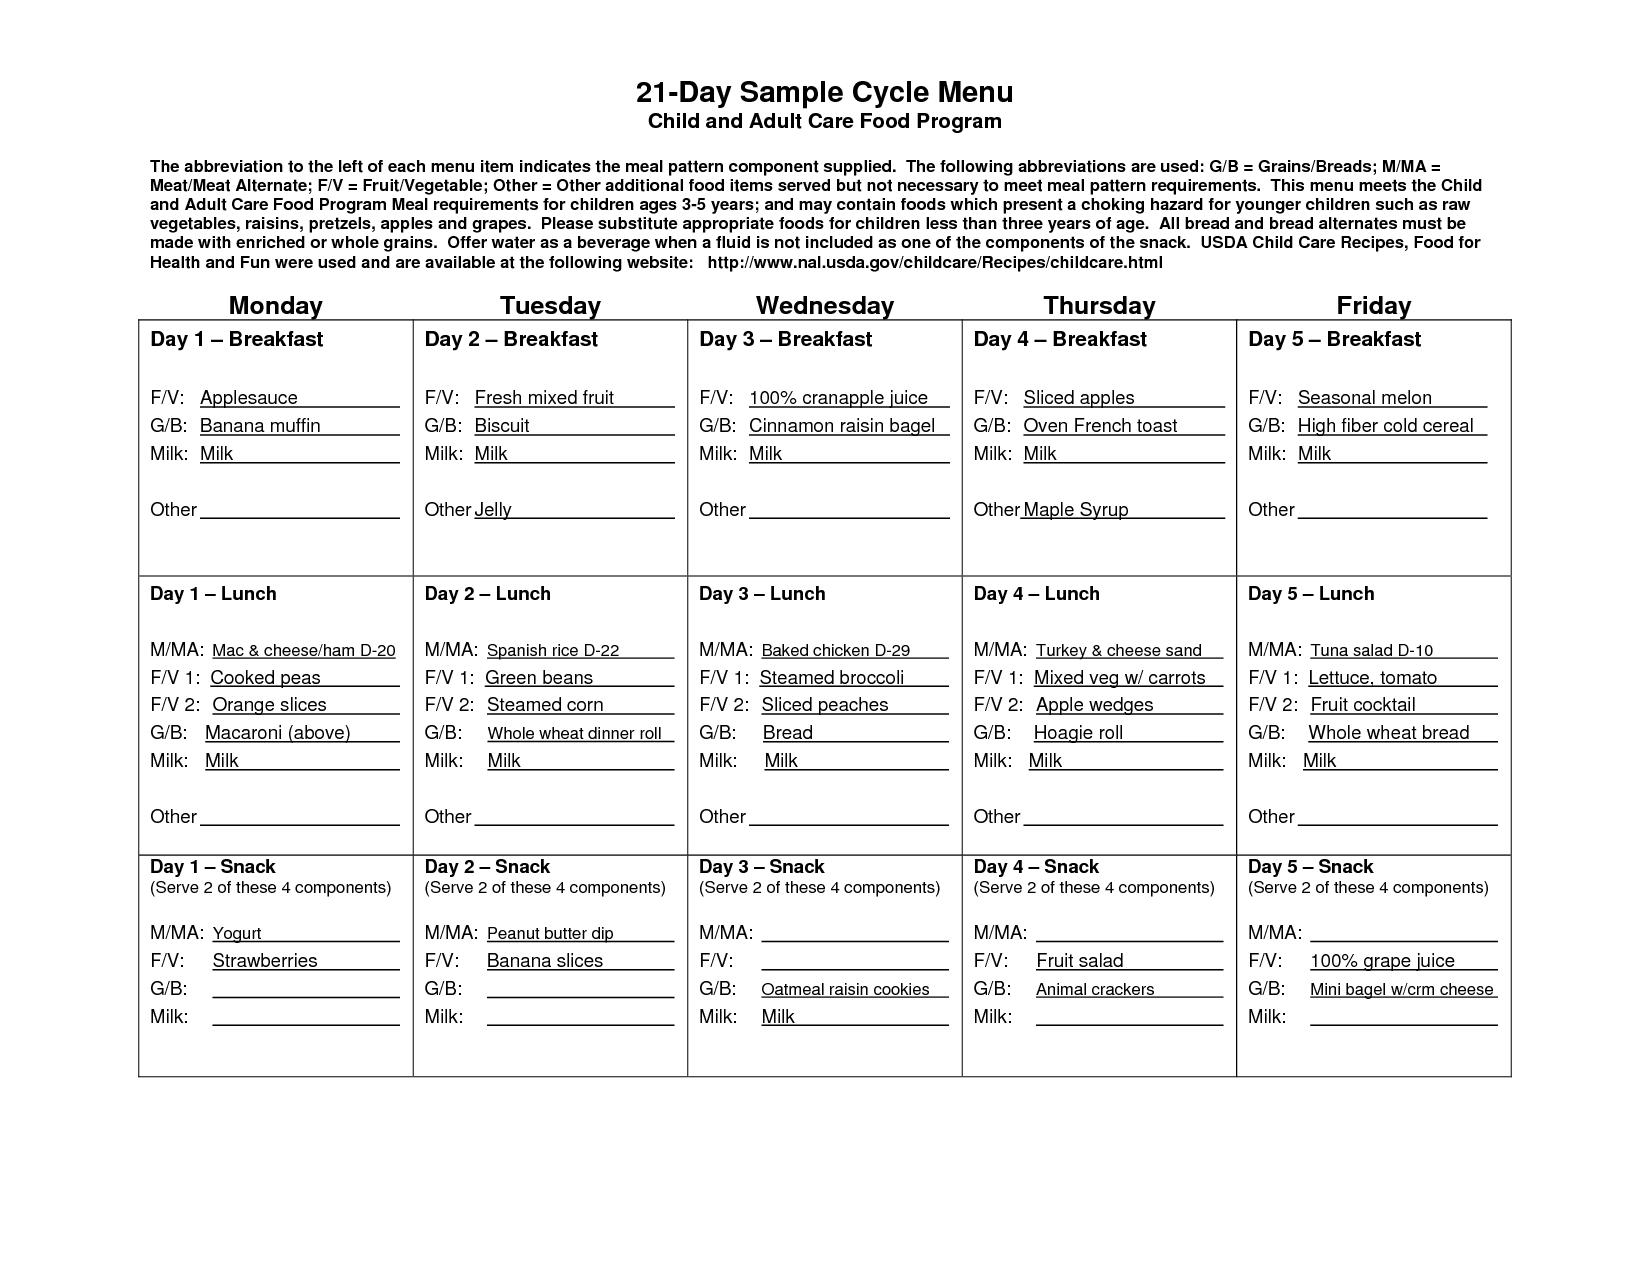 Cycle Menu Template | 21-Day Sample Cycle Menu - Pdf | Food In 2019 pertaining to Monthly 5 Week Menu Rotation Template